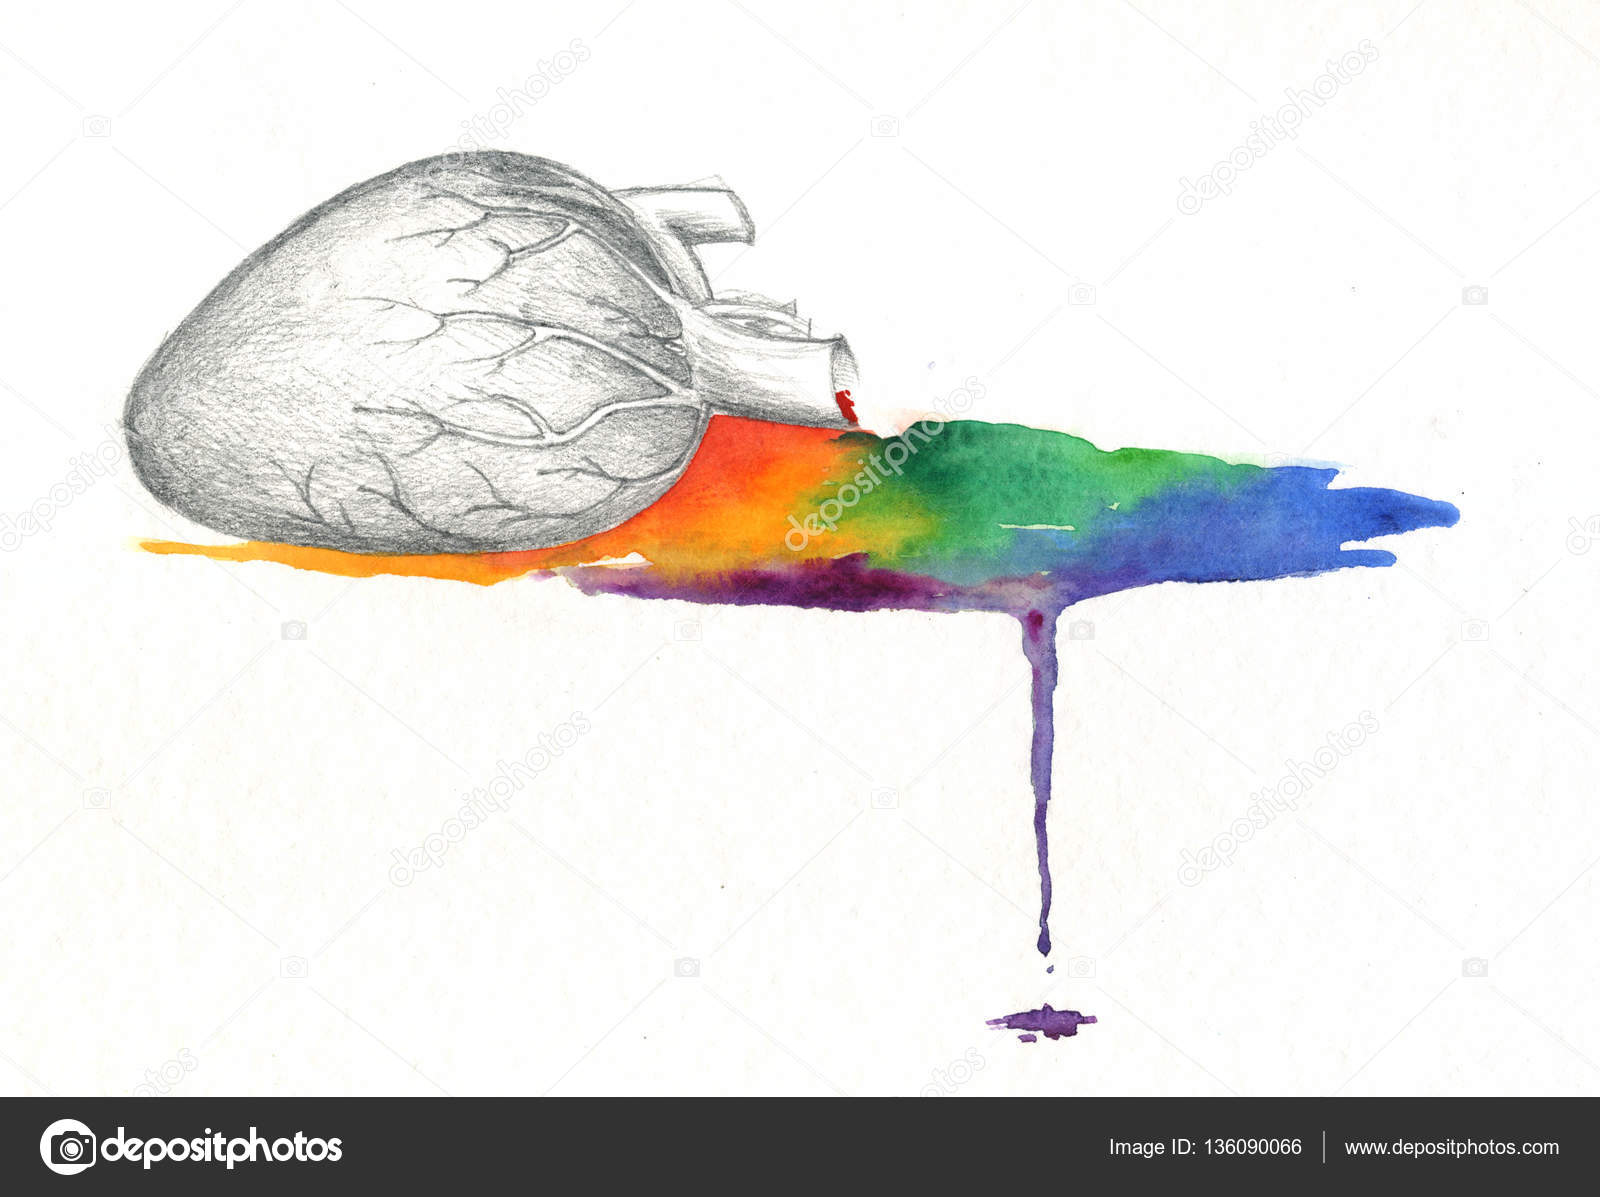 Zlomene Srdce Krvaceni Rainbow Akvarel Stock Fotografie